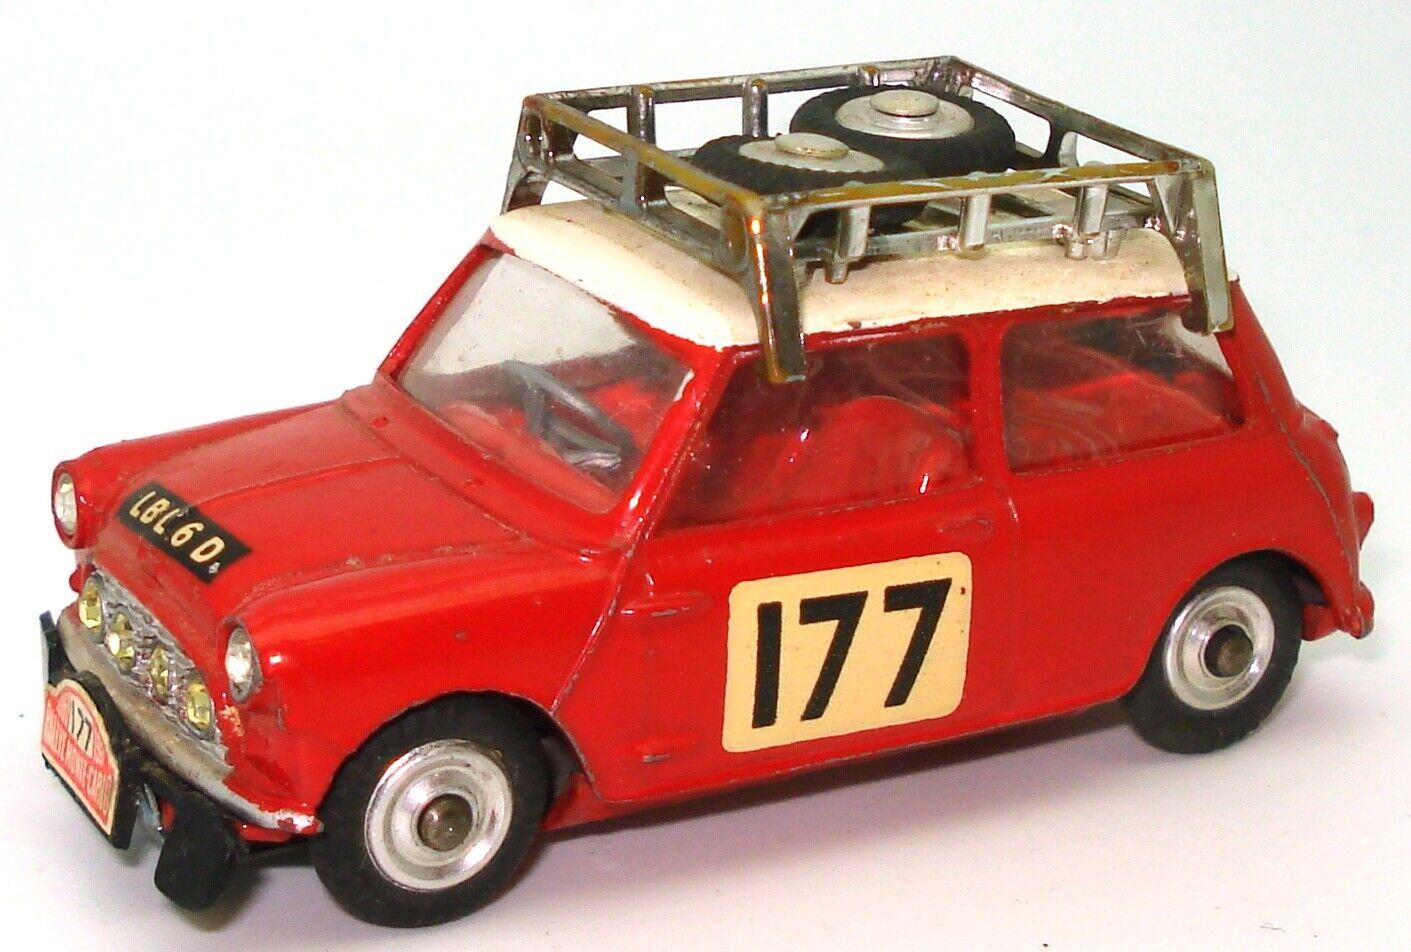 CORGI NO. 339 MORRIS MINI COOPER 'S' MONTE voitureLO 1967  - RARE  L2  à vendre en ligne